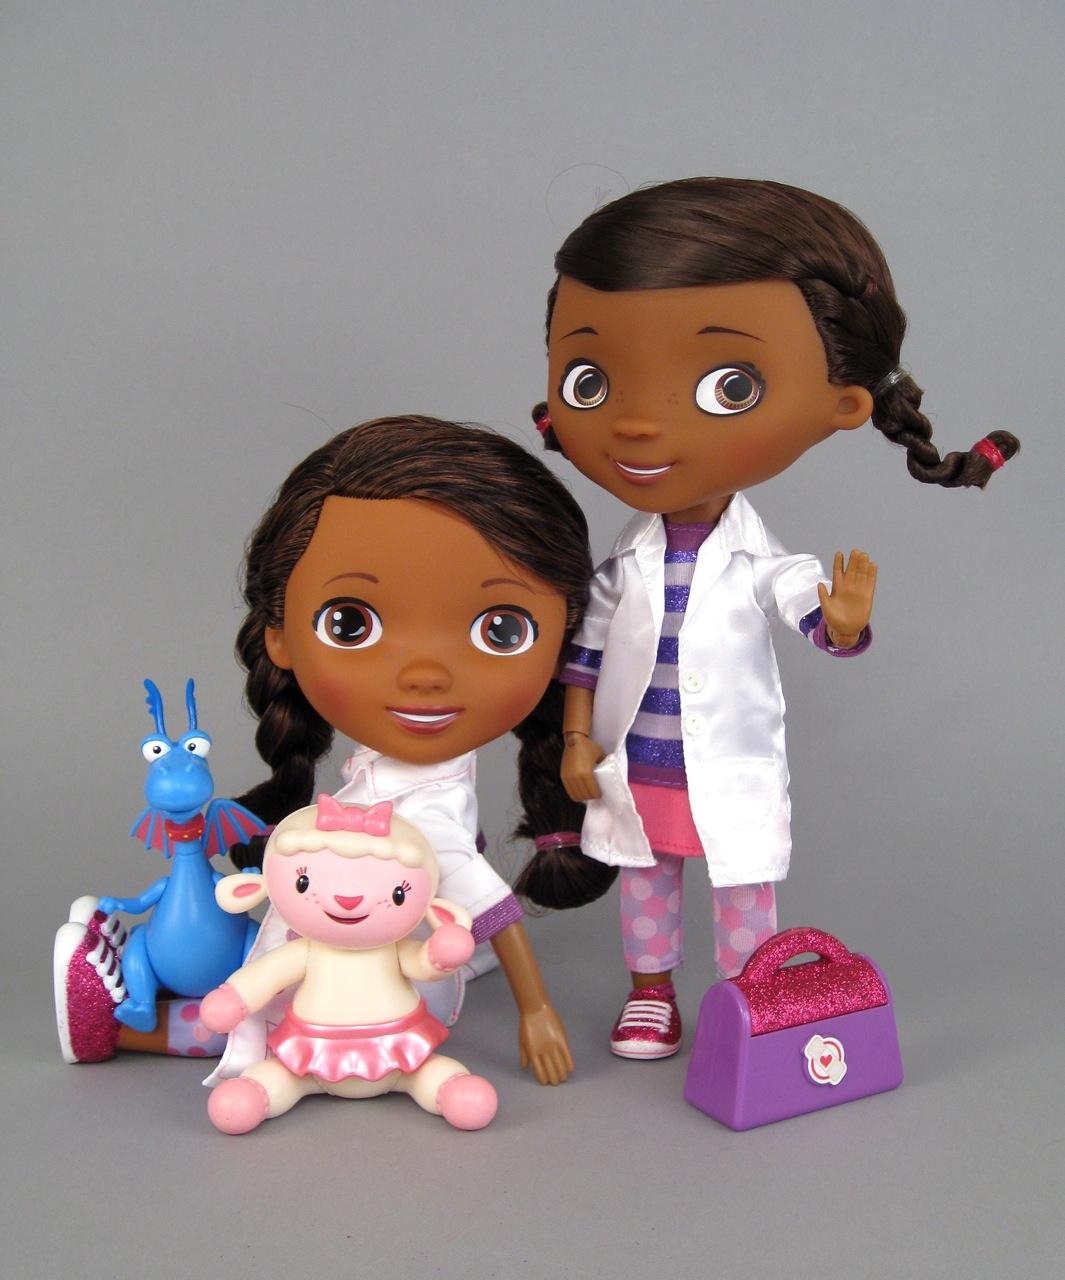 Doc McStuffins dolls